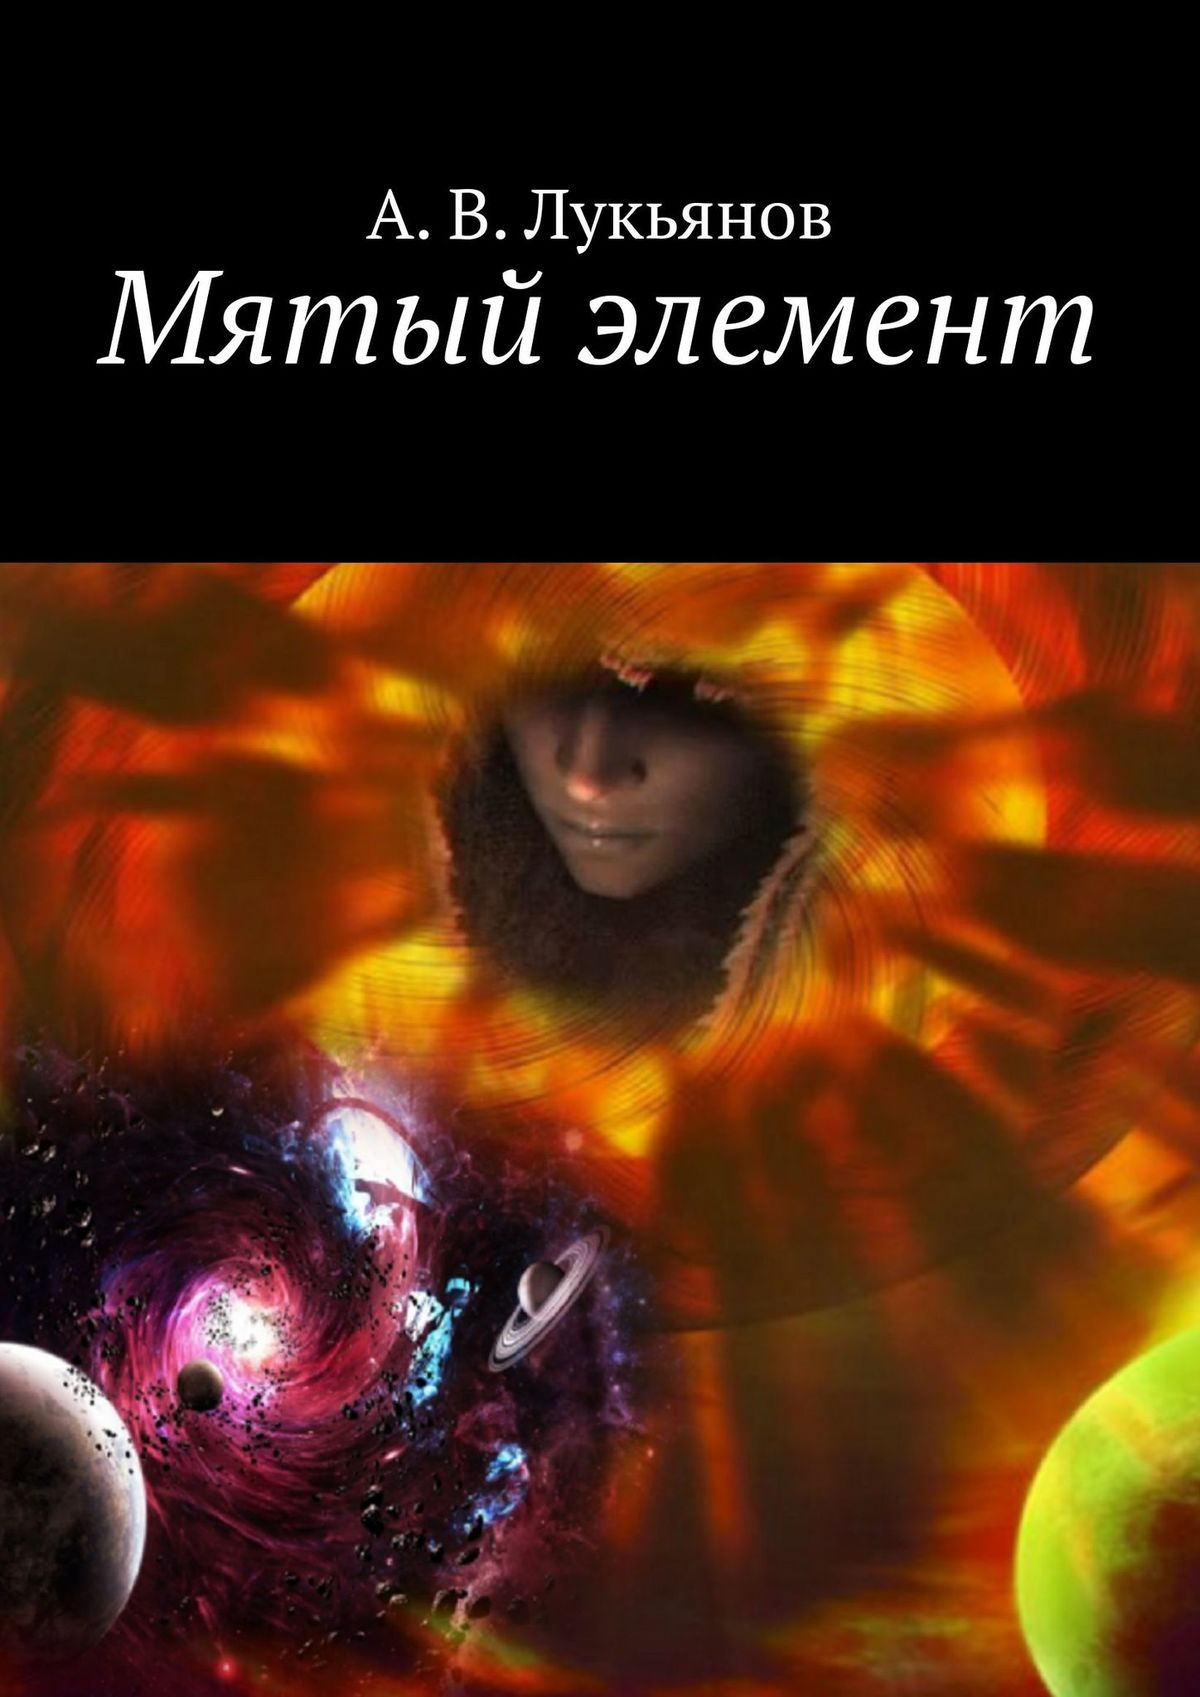 Мятый элемент